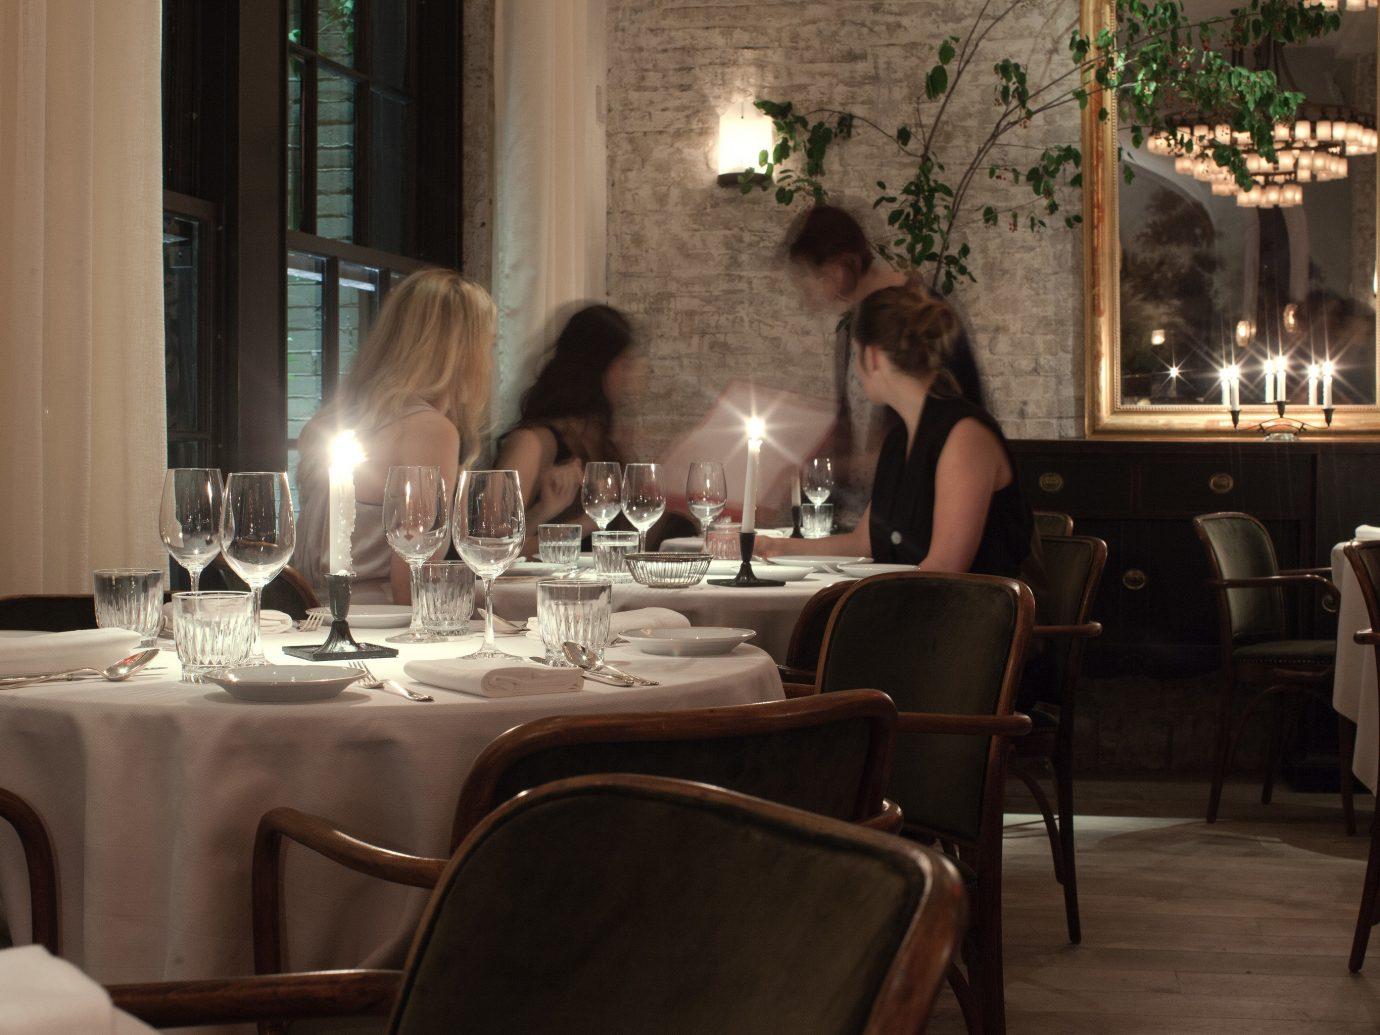 Hotels indoor window restaurant meal room function hall Bar interior design dining table